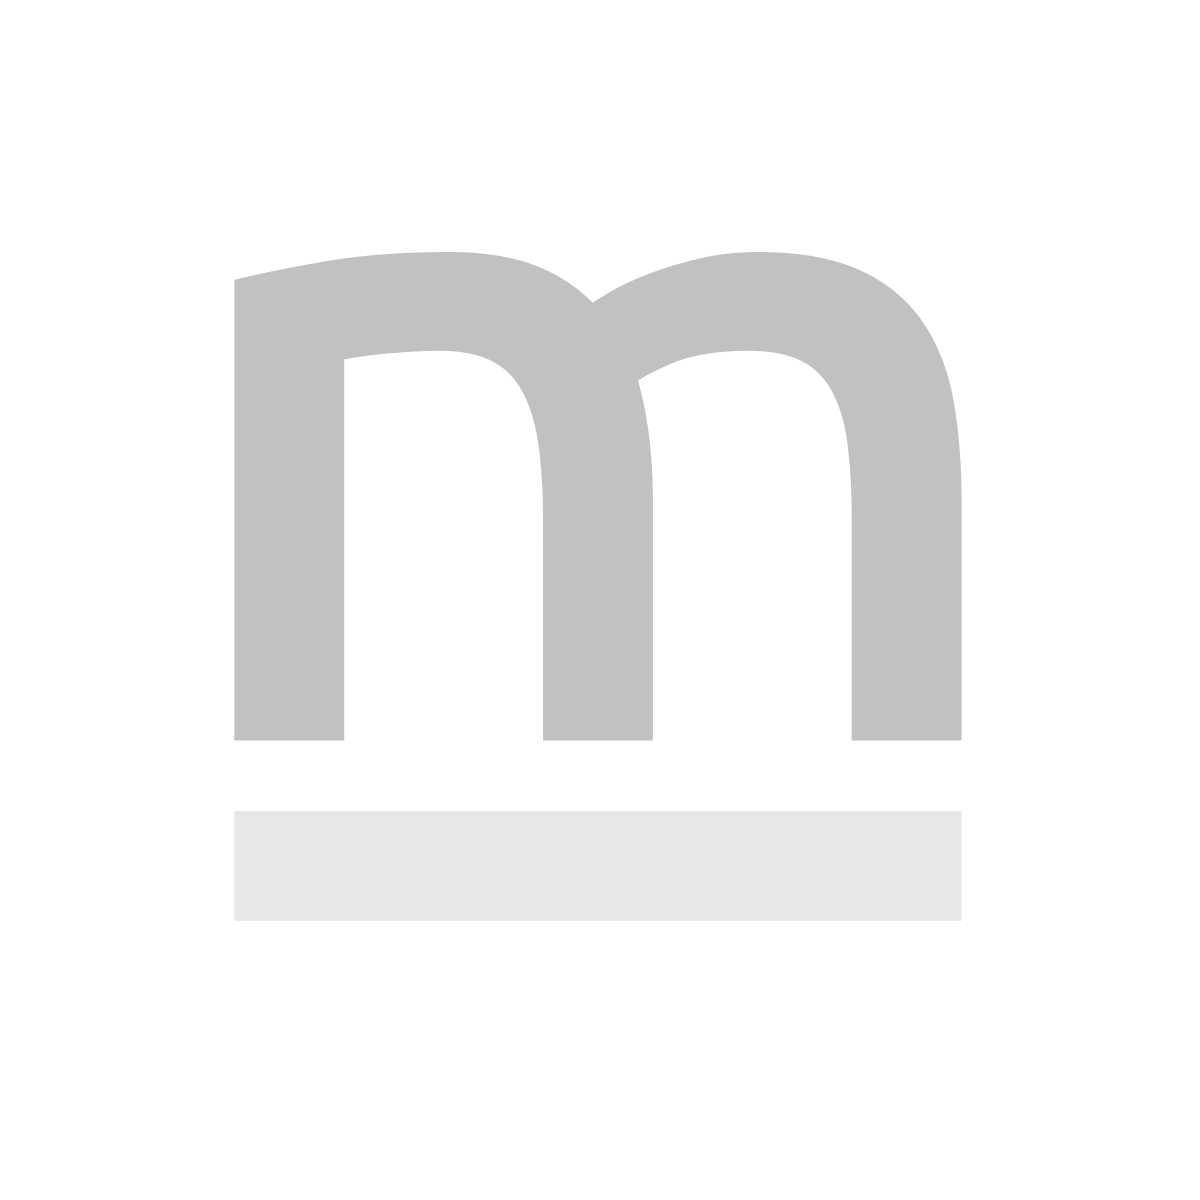 Obraz - Natura (kolekcja)